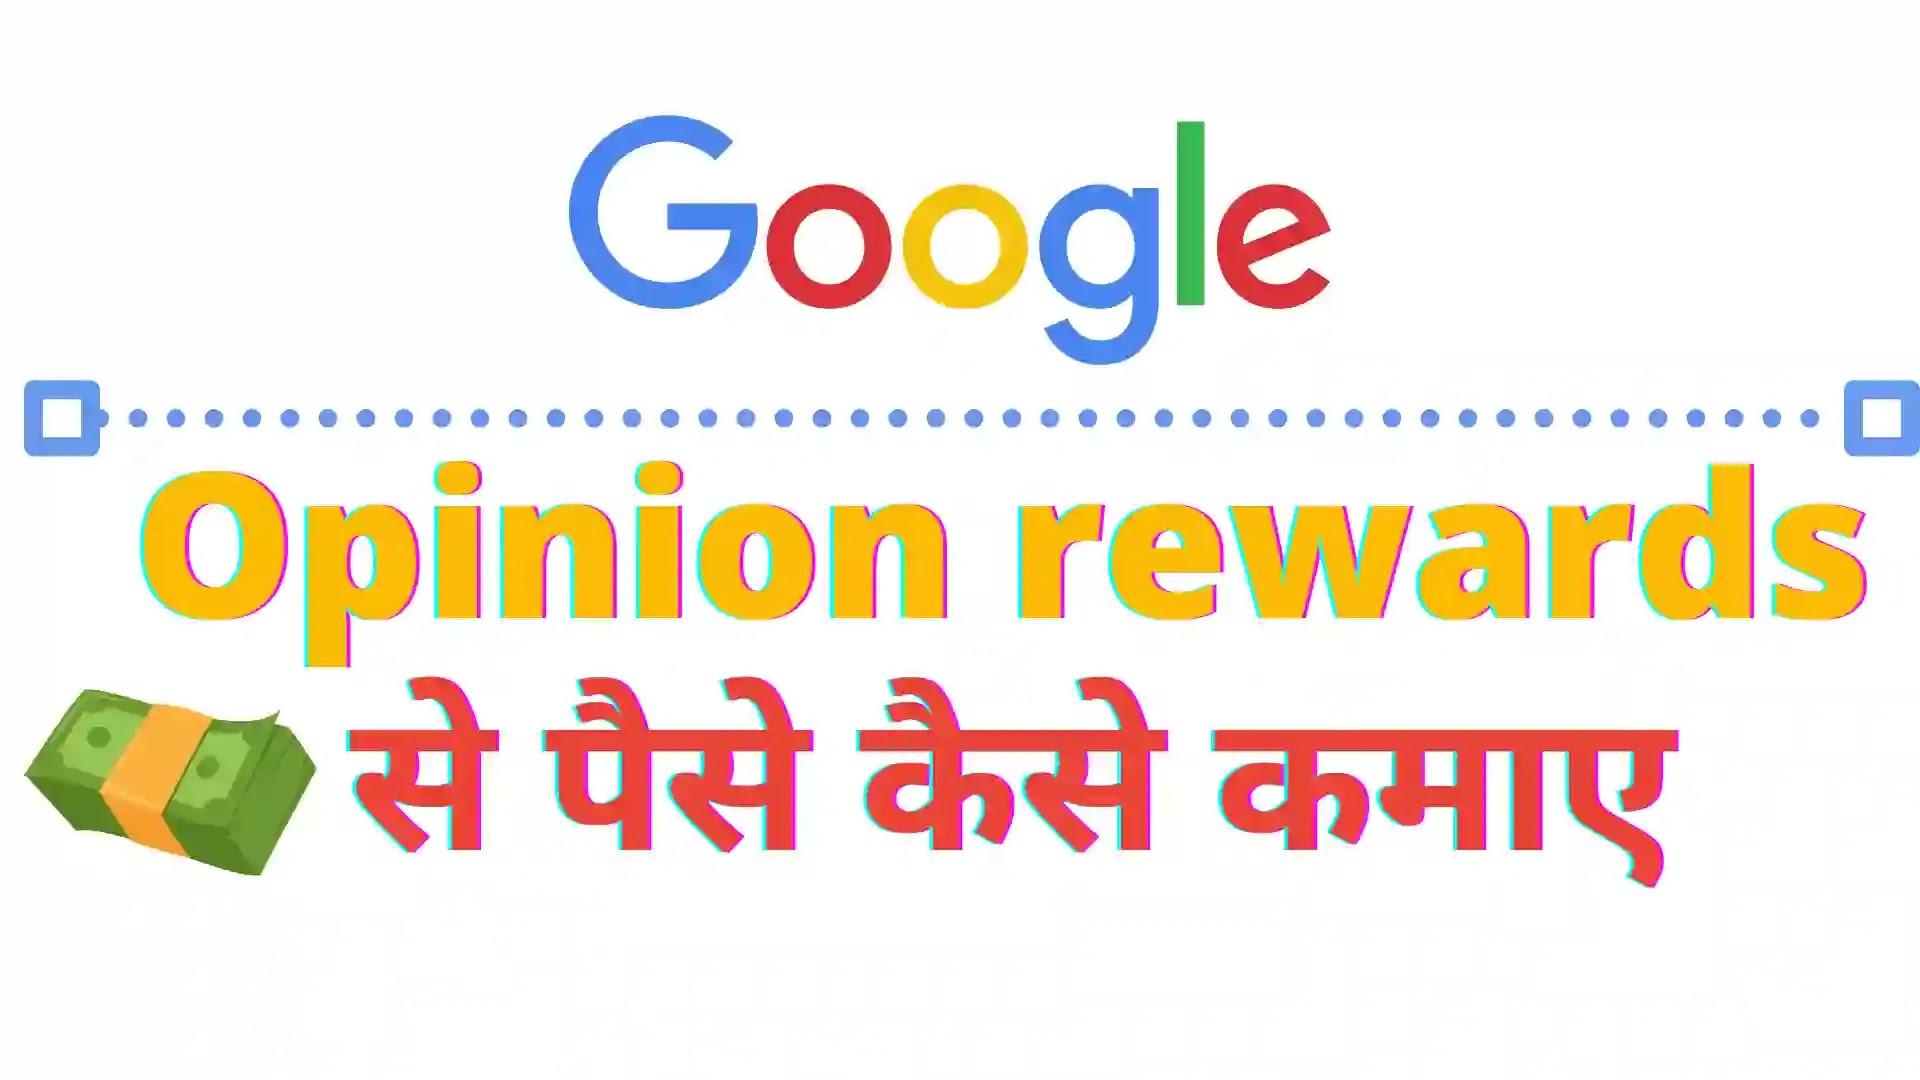 Google opinion rewards क्या है ? Google opinion rewards से पैसे कैसे कमाए